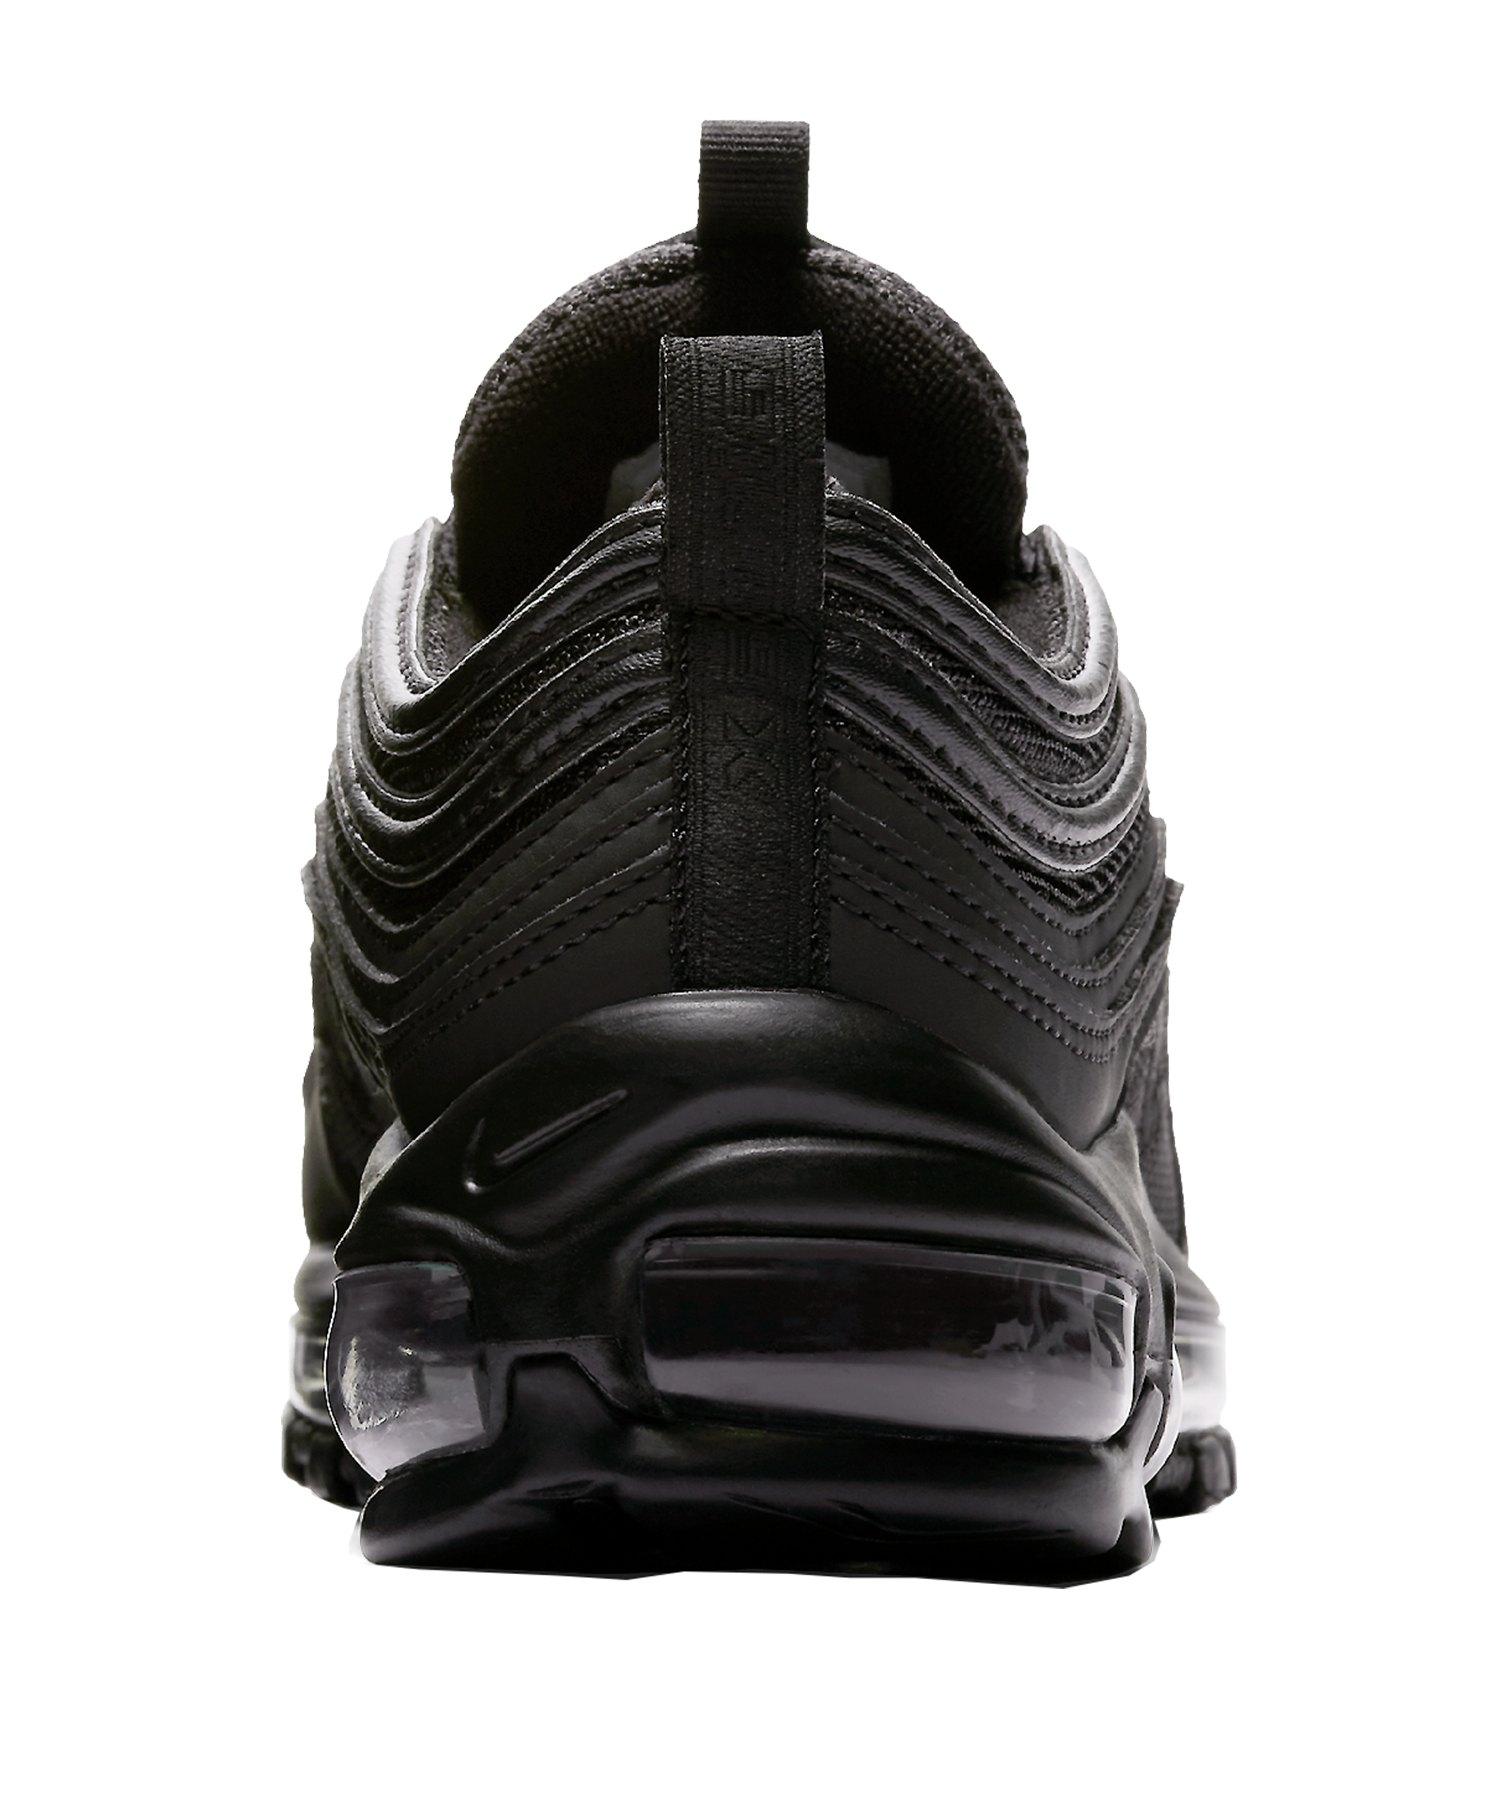 F001 Schwarz 97 Nike Sneaker Kids Max Air 8Xn0wOkNP